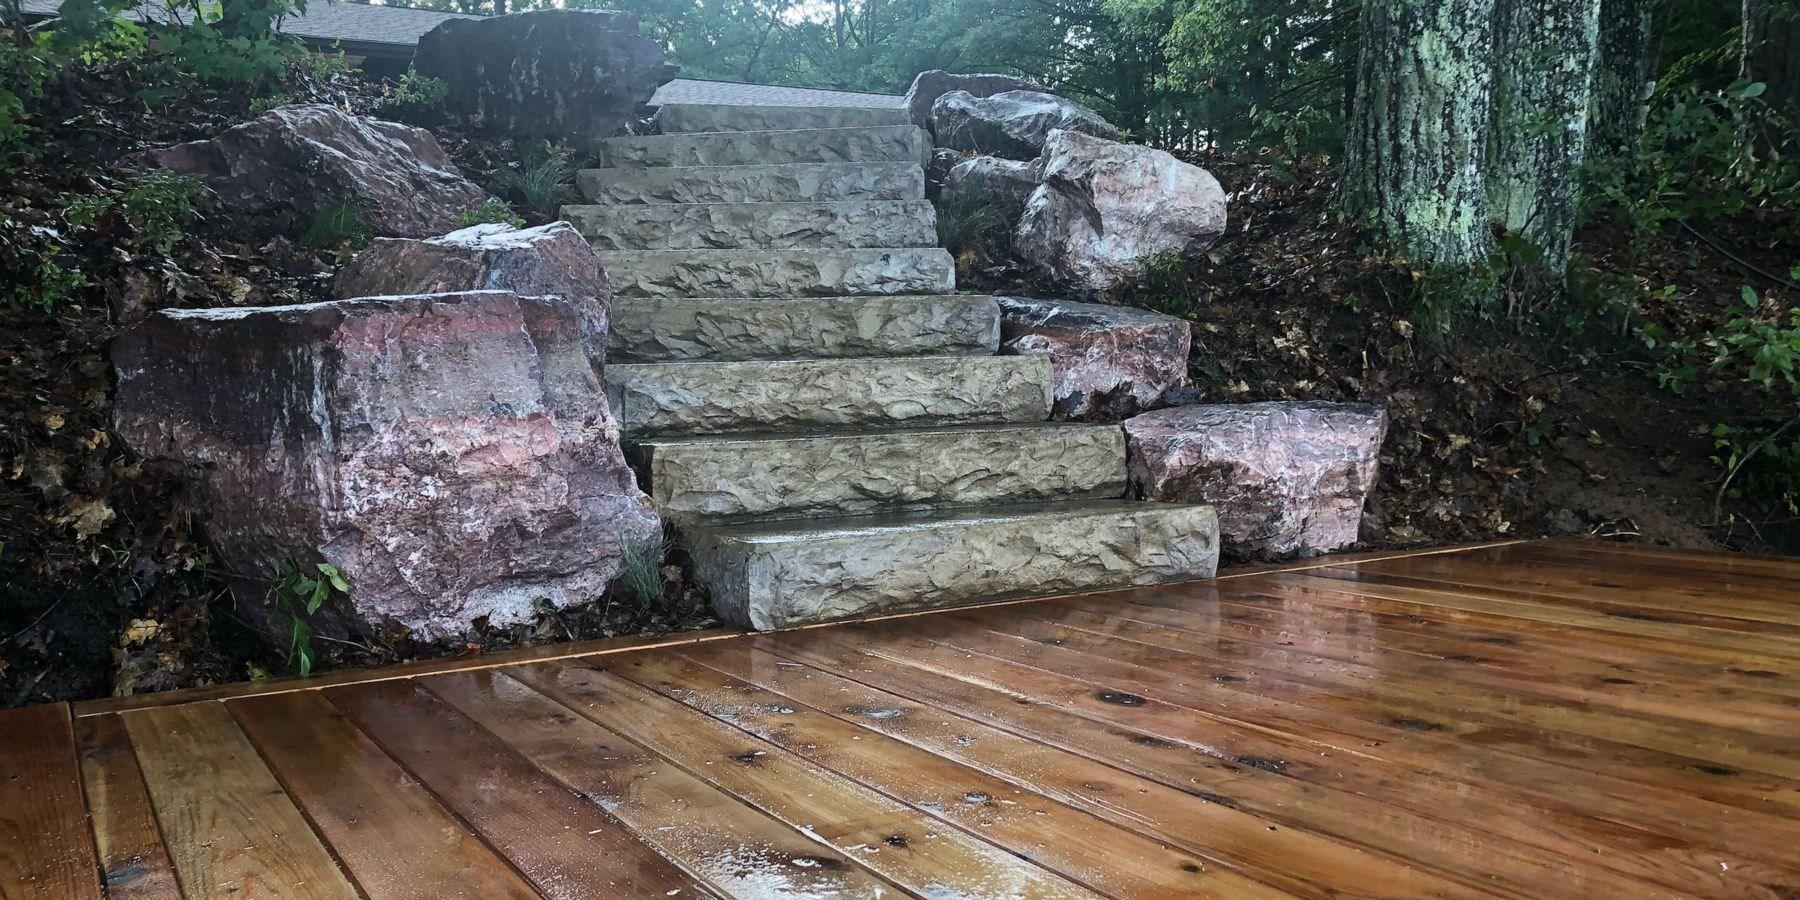 Stone Concrete Steps   Wood Over Concrete Steps   Building   Stair Stringers   Concrete Patio   Concrete Porch Makeover   Composite Decking